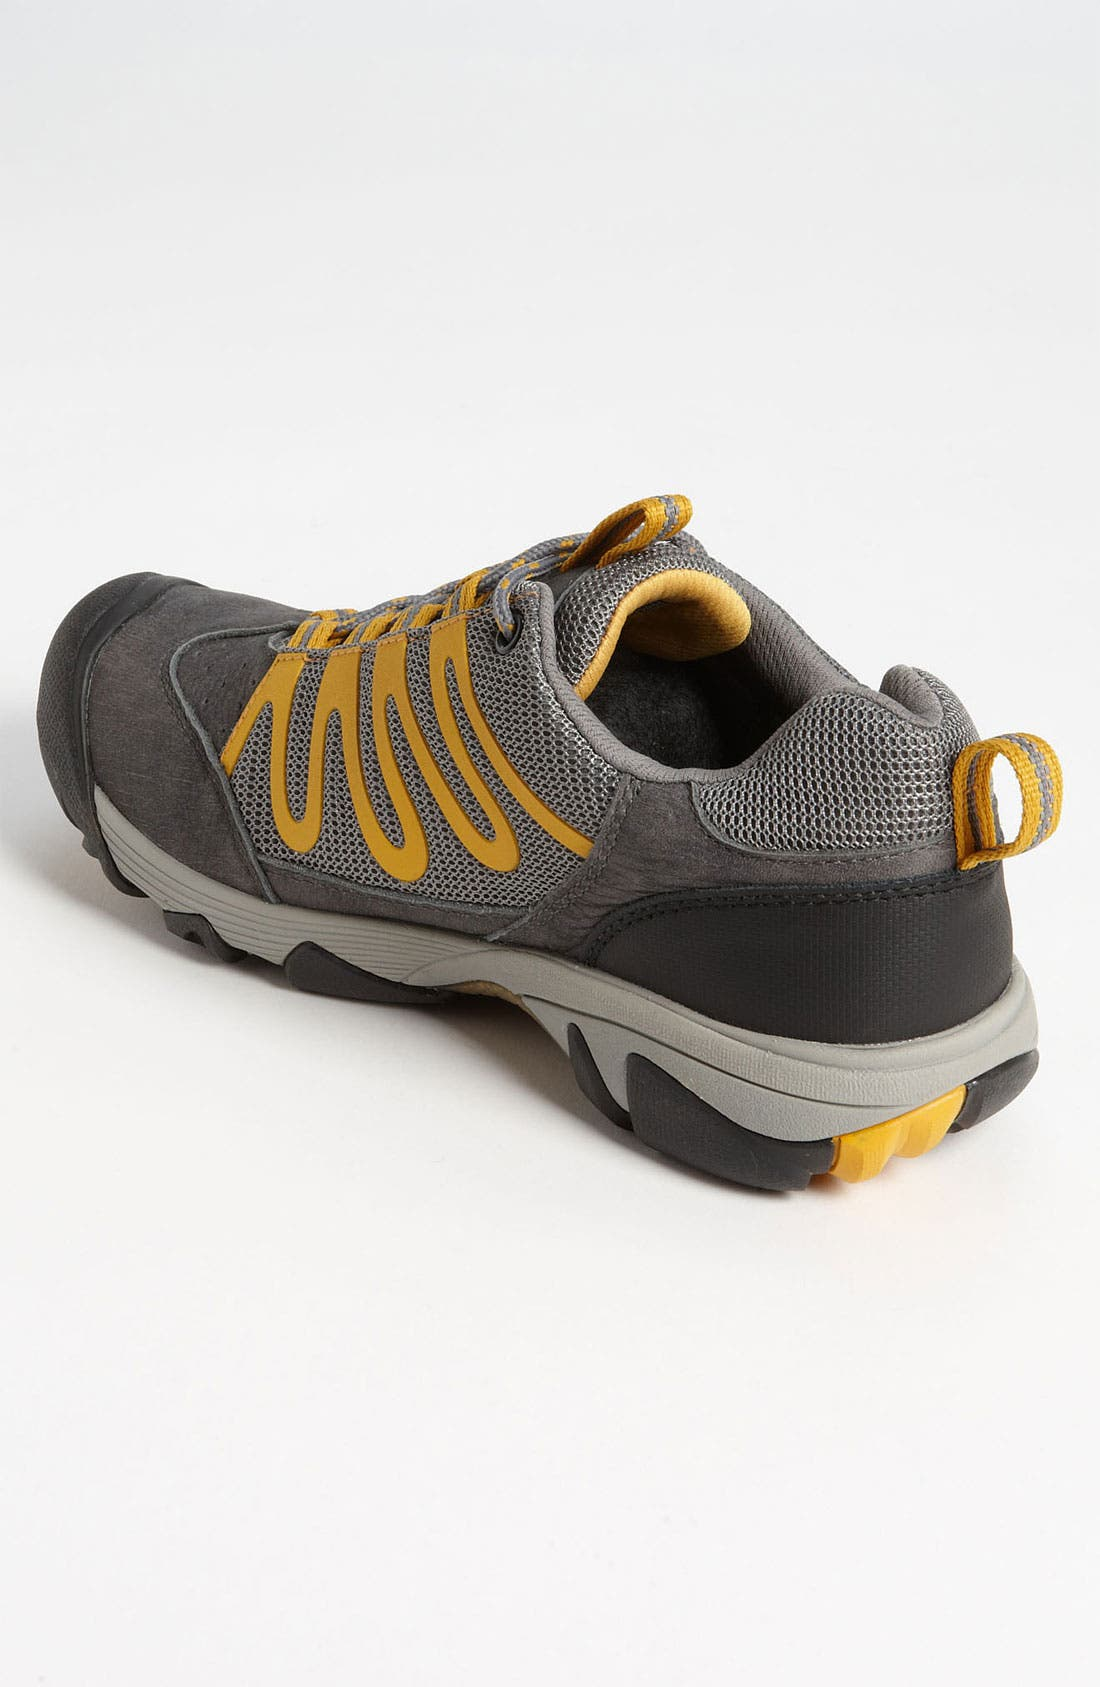 Alternate Image 2  - Keen 'Verdi WP' Hiking Shoe (Men)